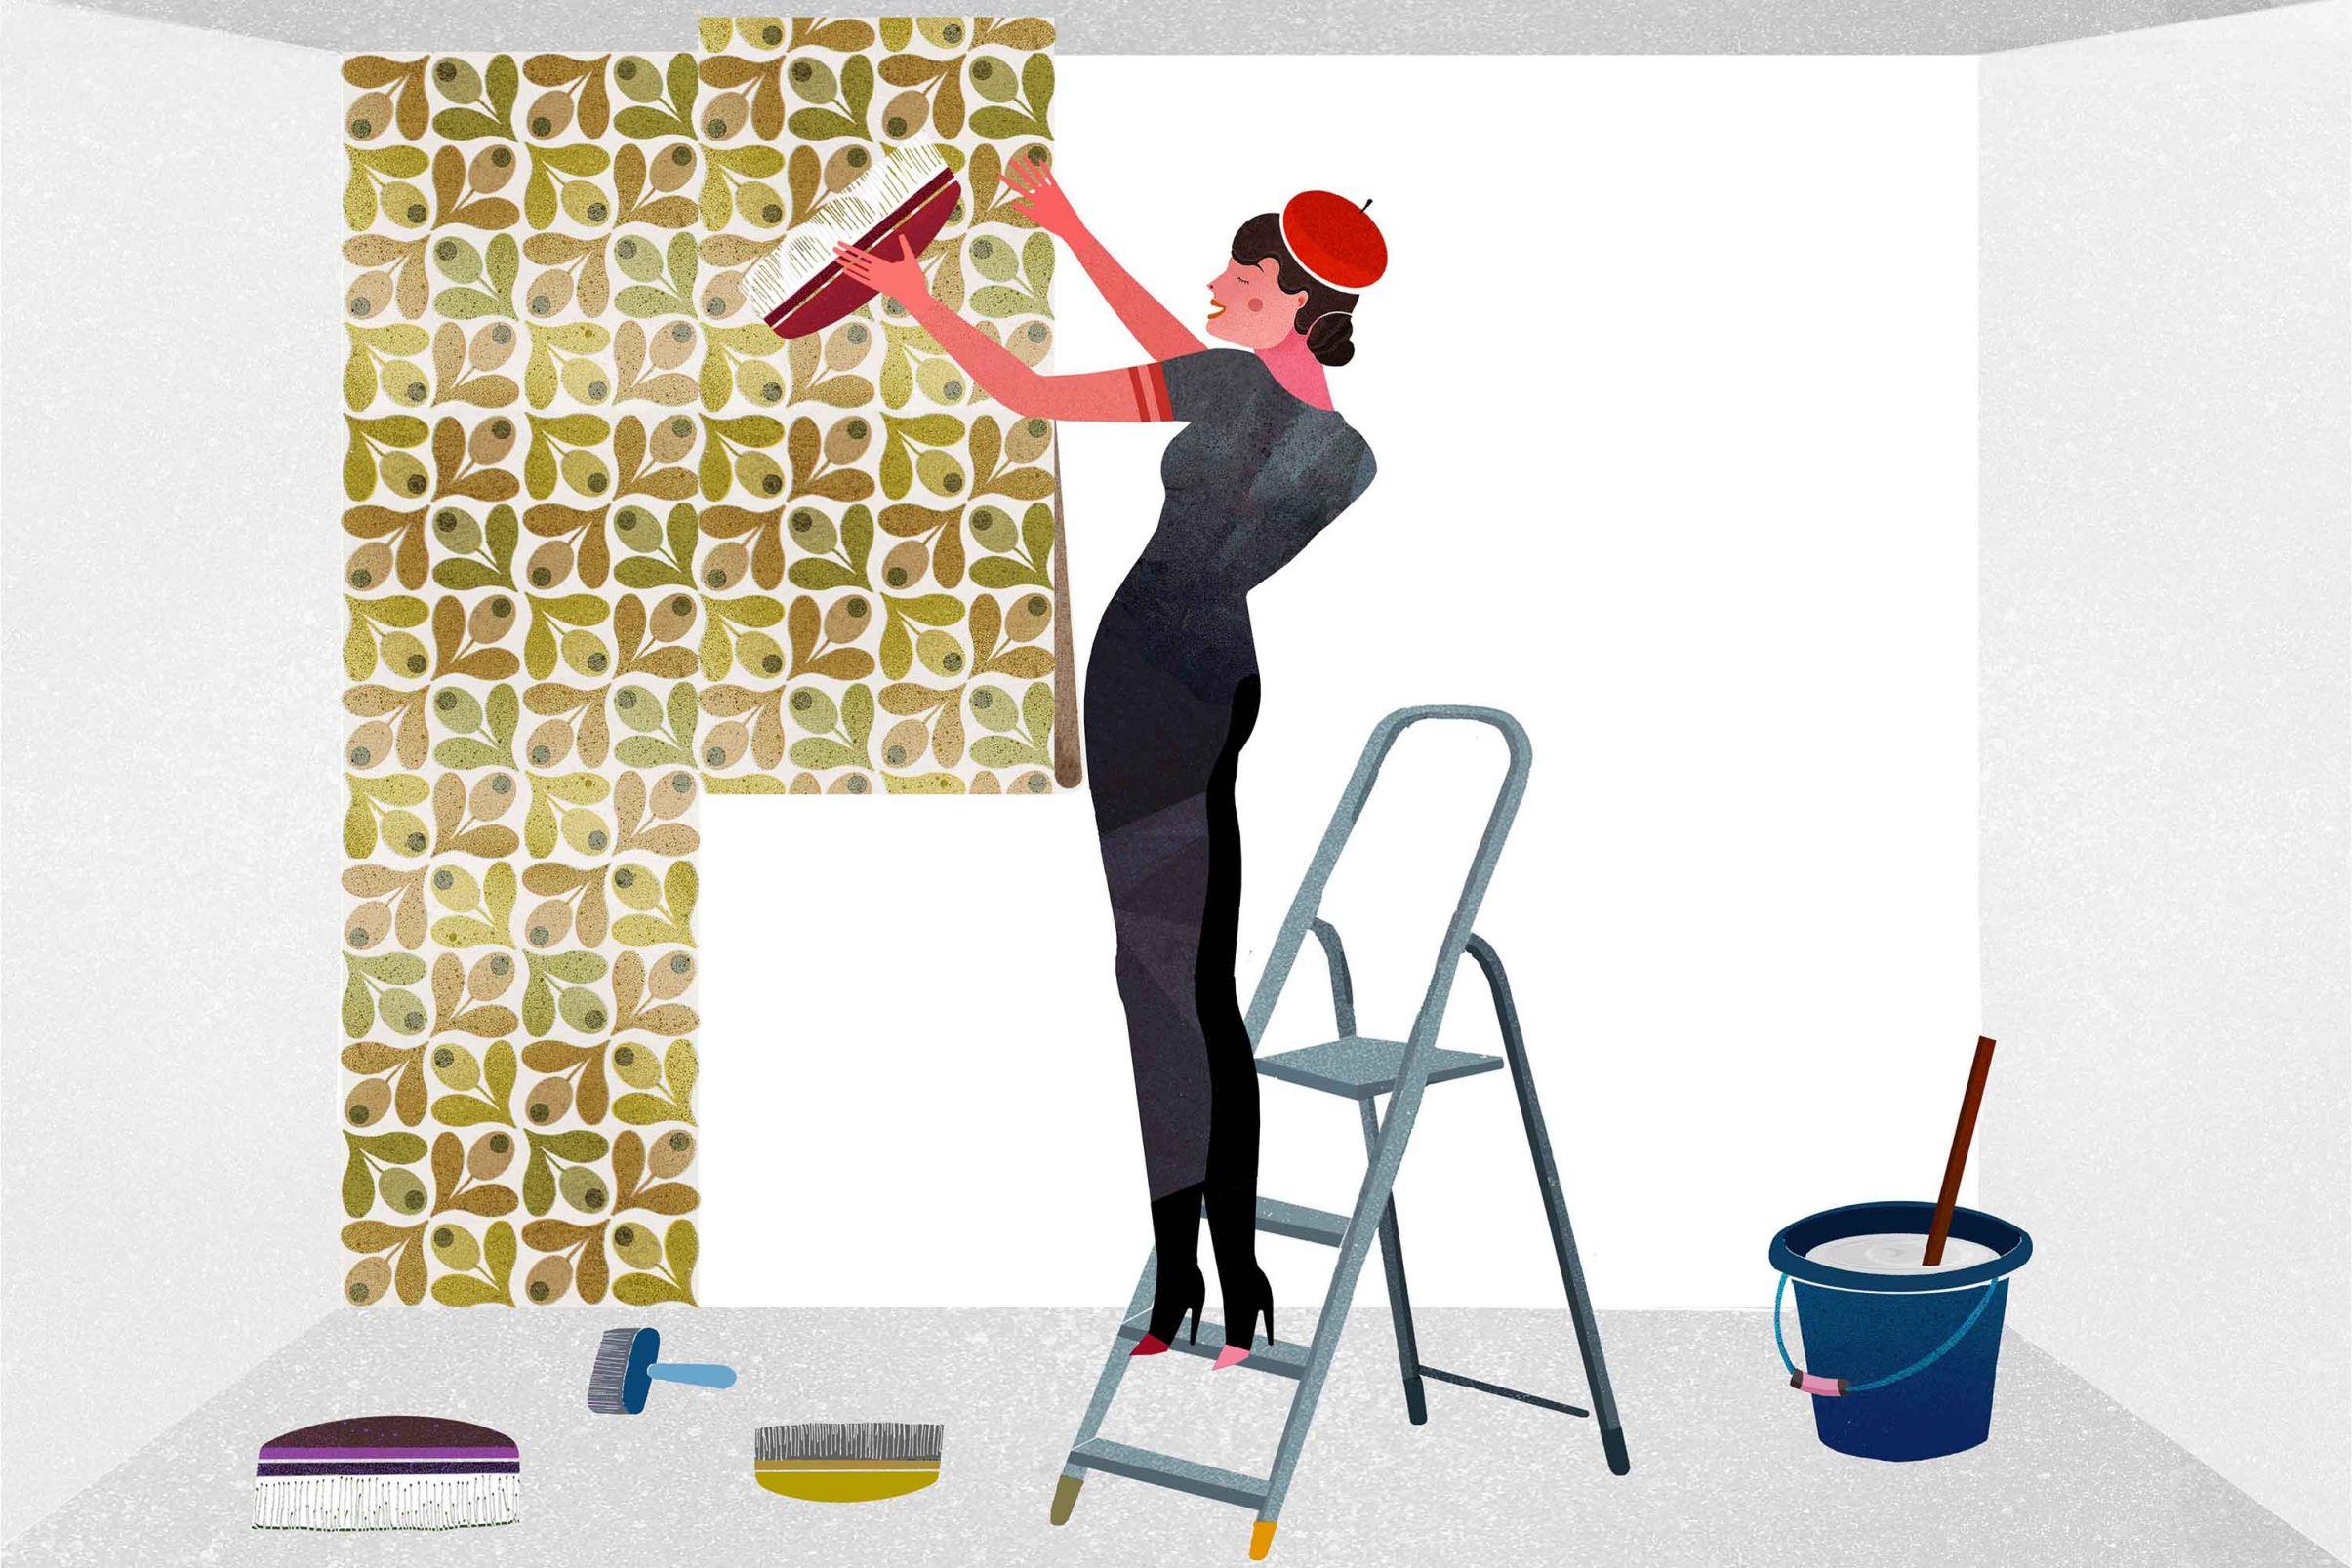 Wie-tapeziere-ich-Papiertapeten-Tapetenbahn-an-der-Wand-anbringen